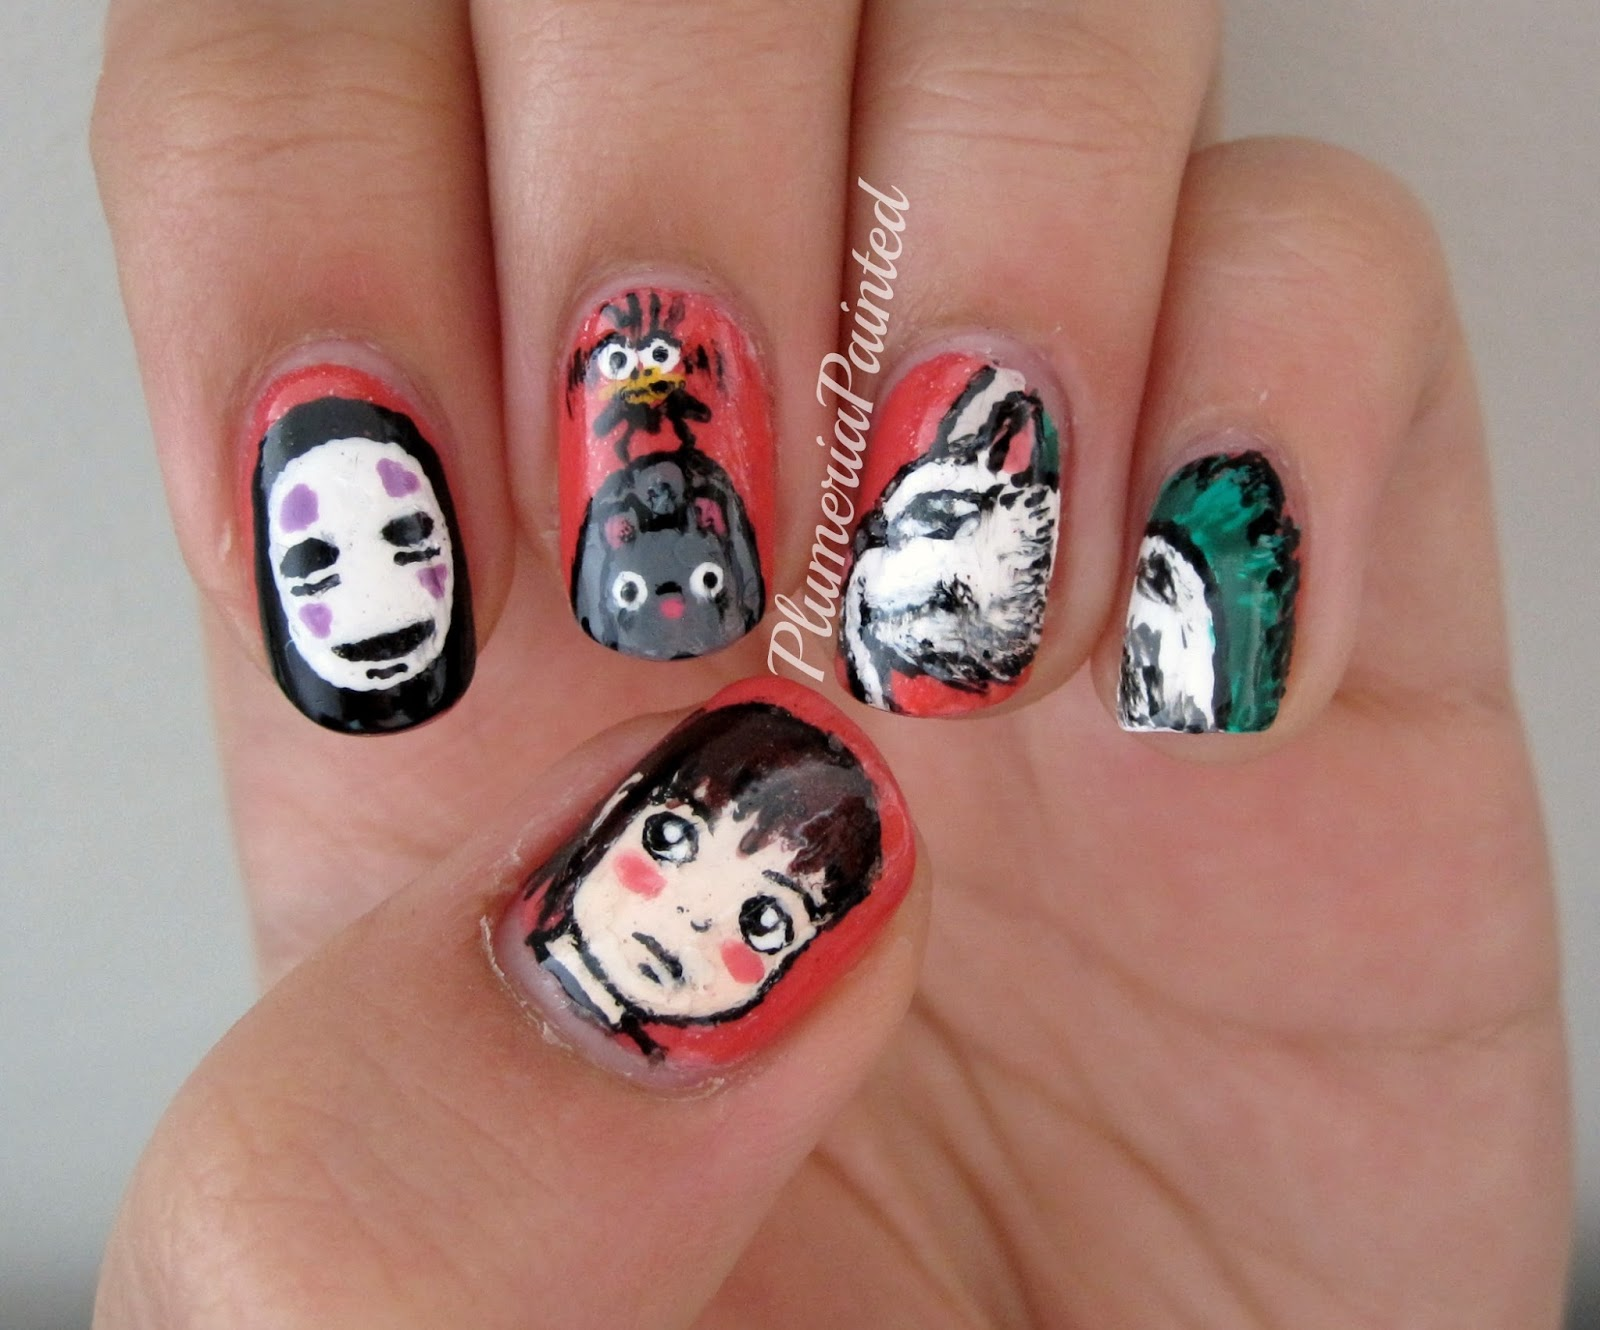 PlumeriaPainted: Spirited Away Nails